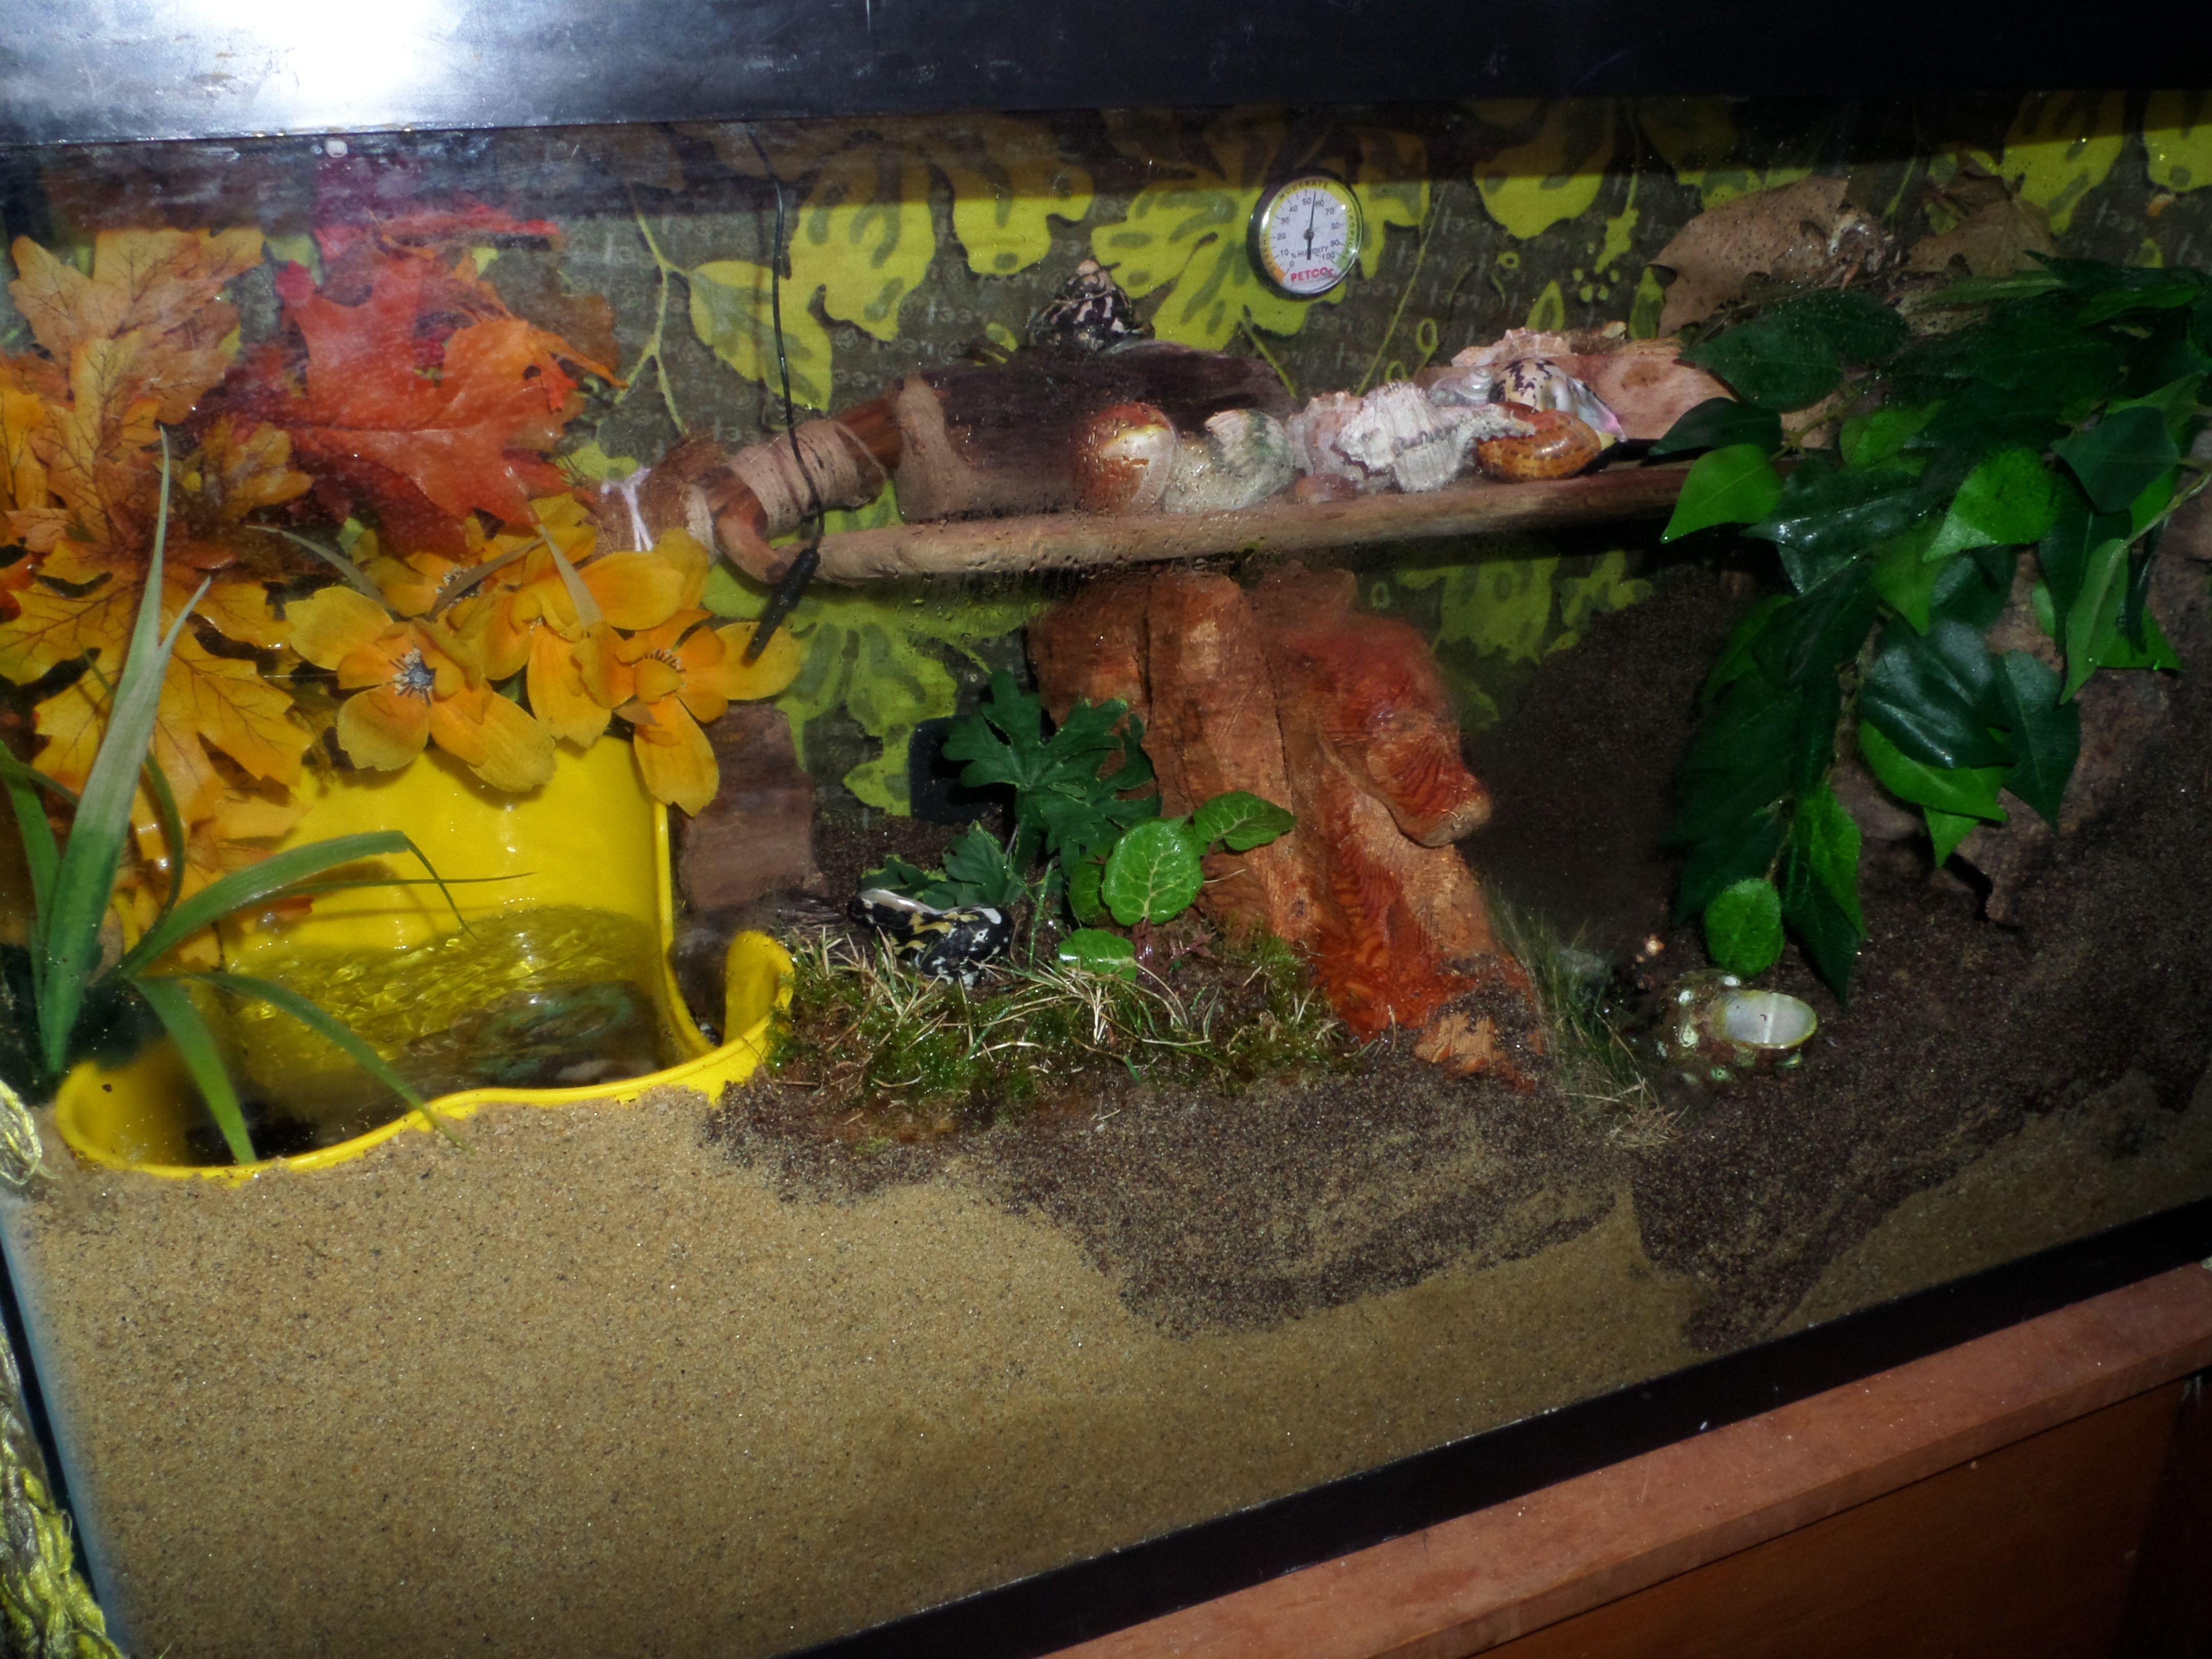 Pin By Lynn Soper On Hermit Crab Photos I Like Hermit Crab Habitat